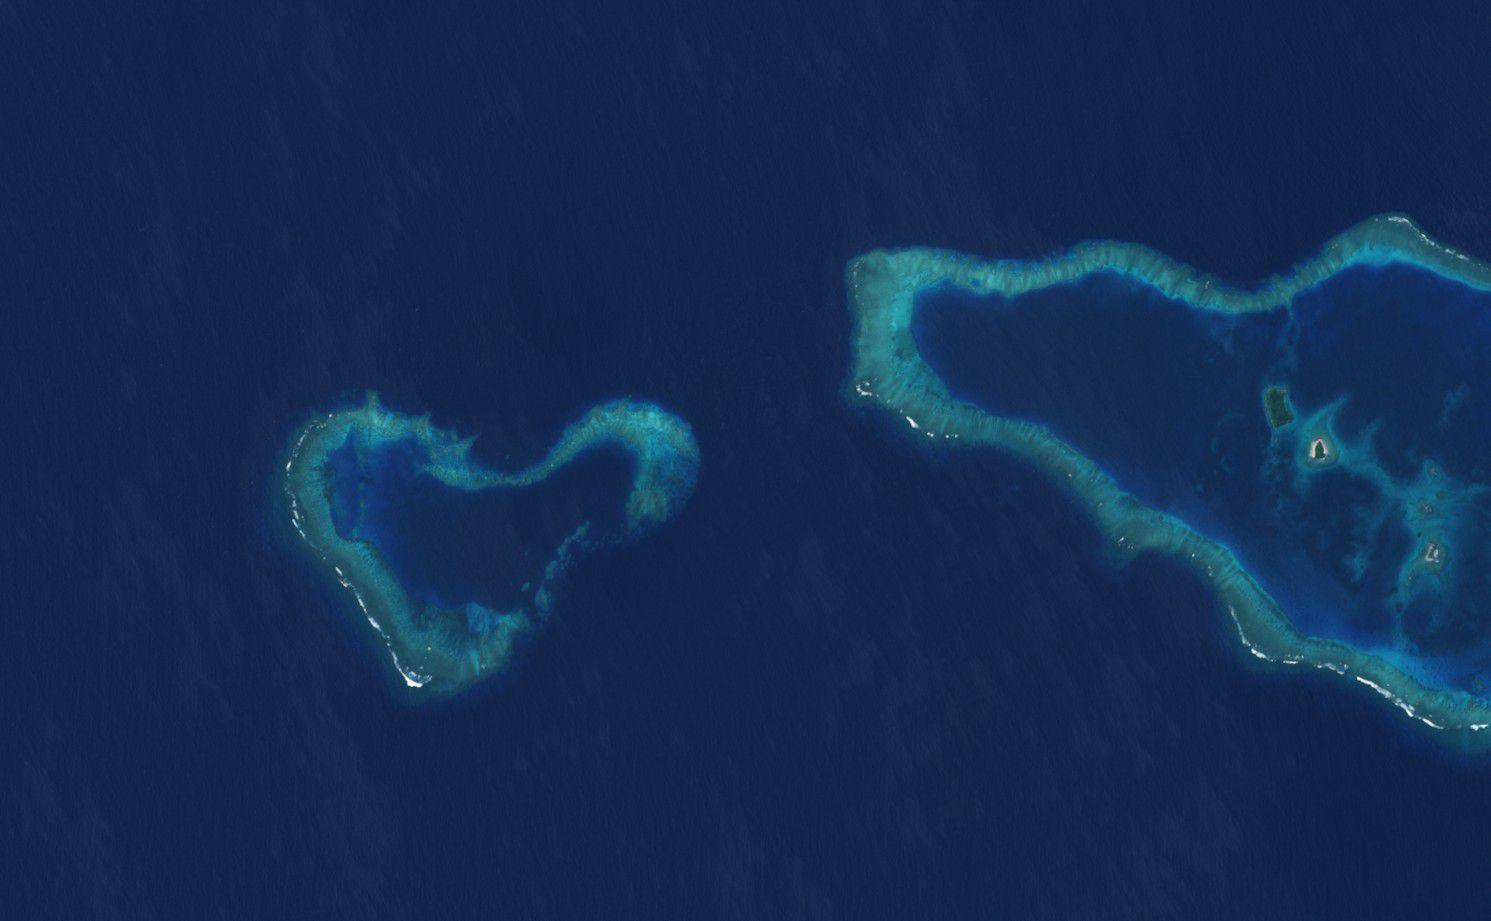 Saint-Valentin - île en forme de coeur - Fidji - satellite - Sentinel-2 - Copernicus - espace - Earth observation